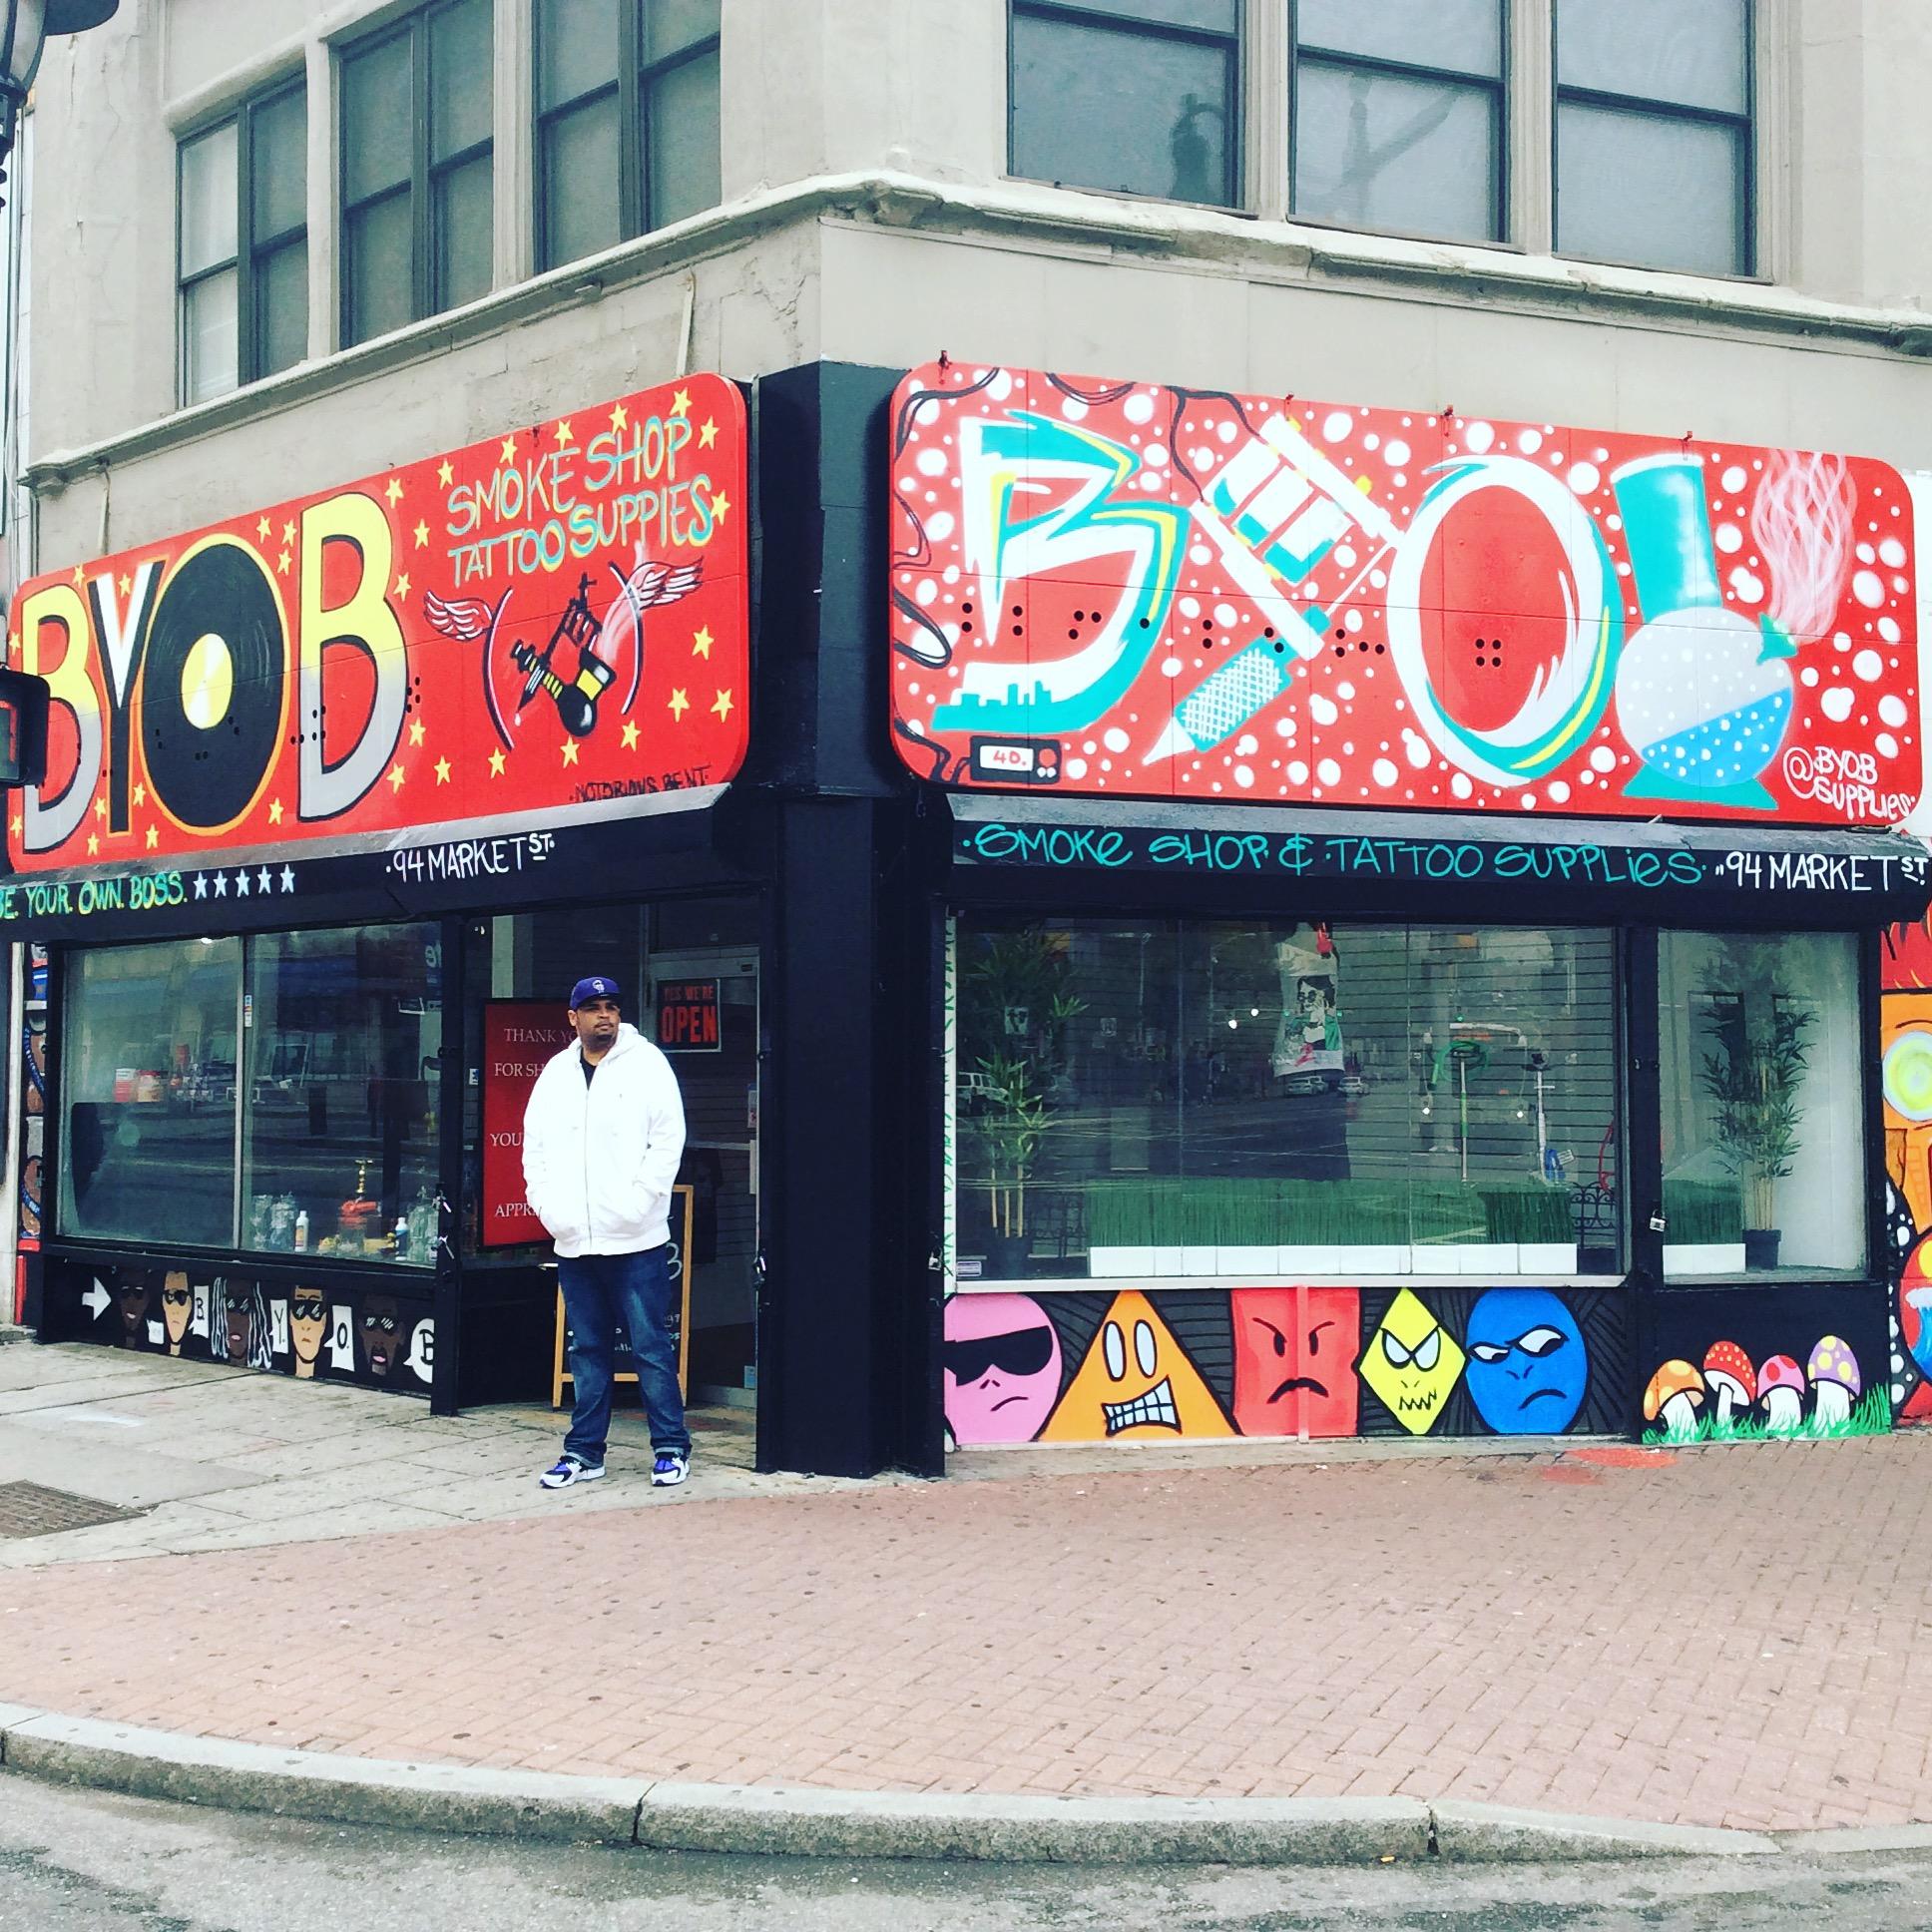 Byob Smoke Shop Tattoo Supplies 94 Market St Newark Nj